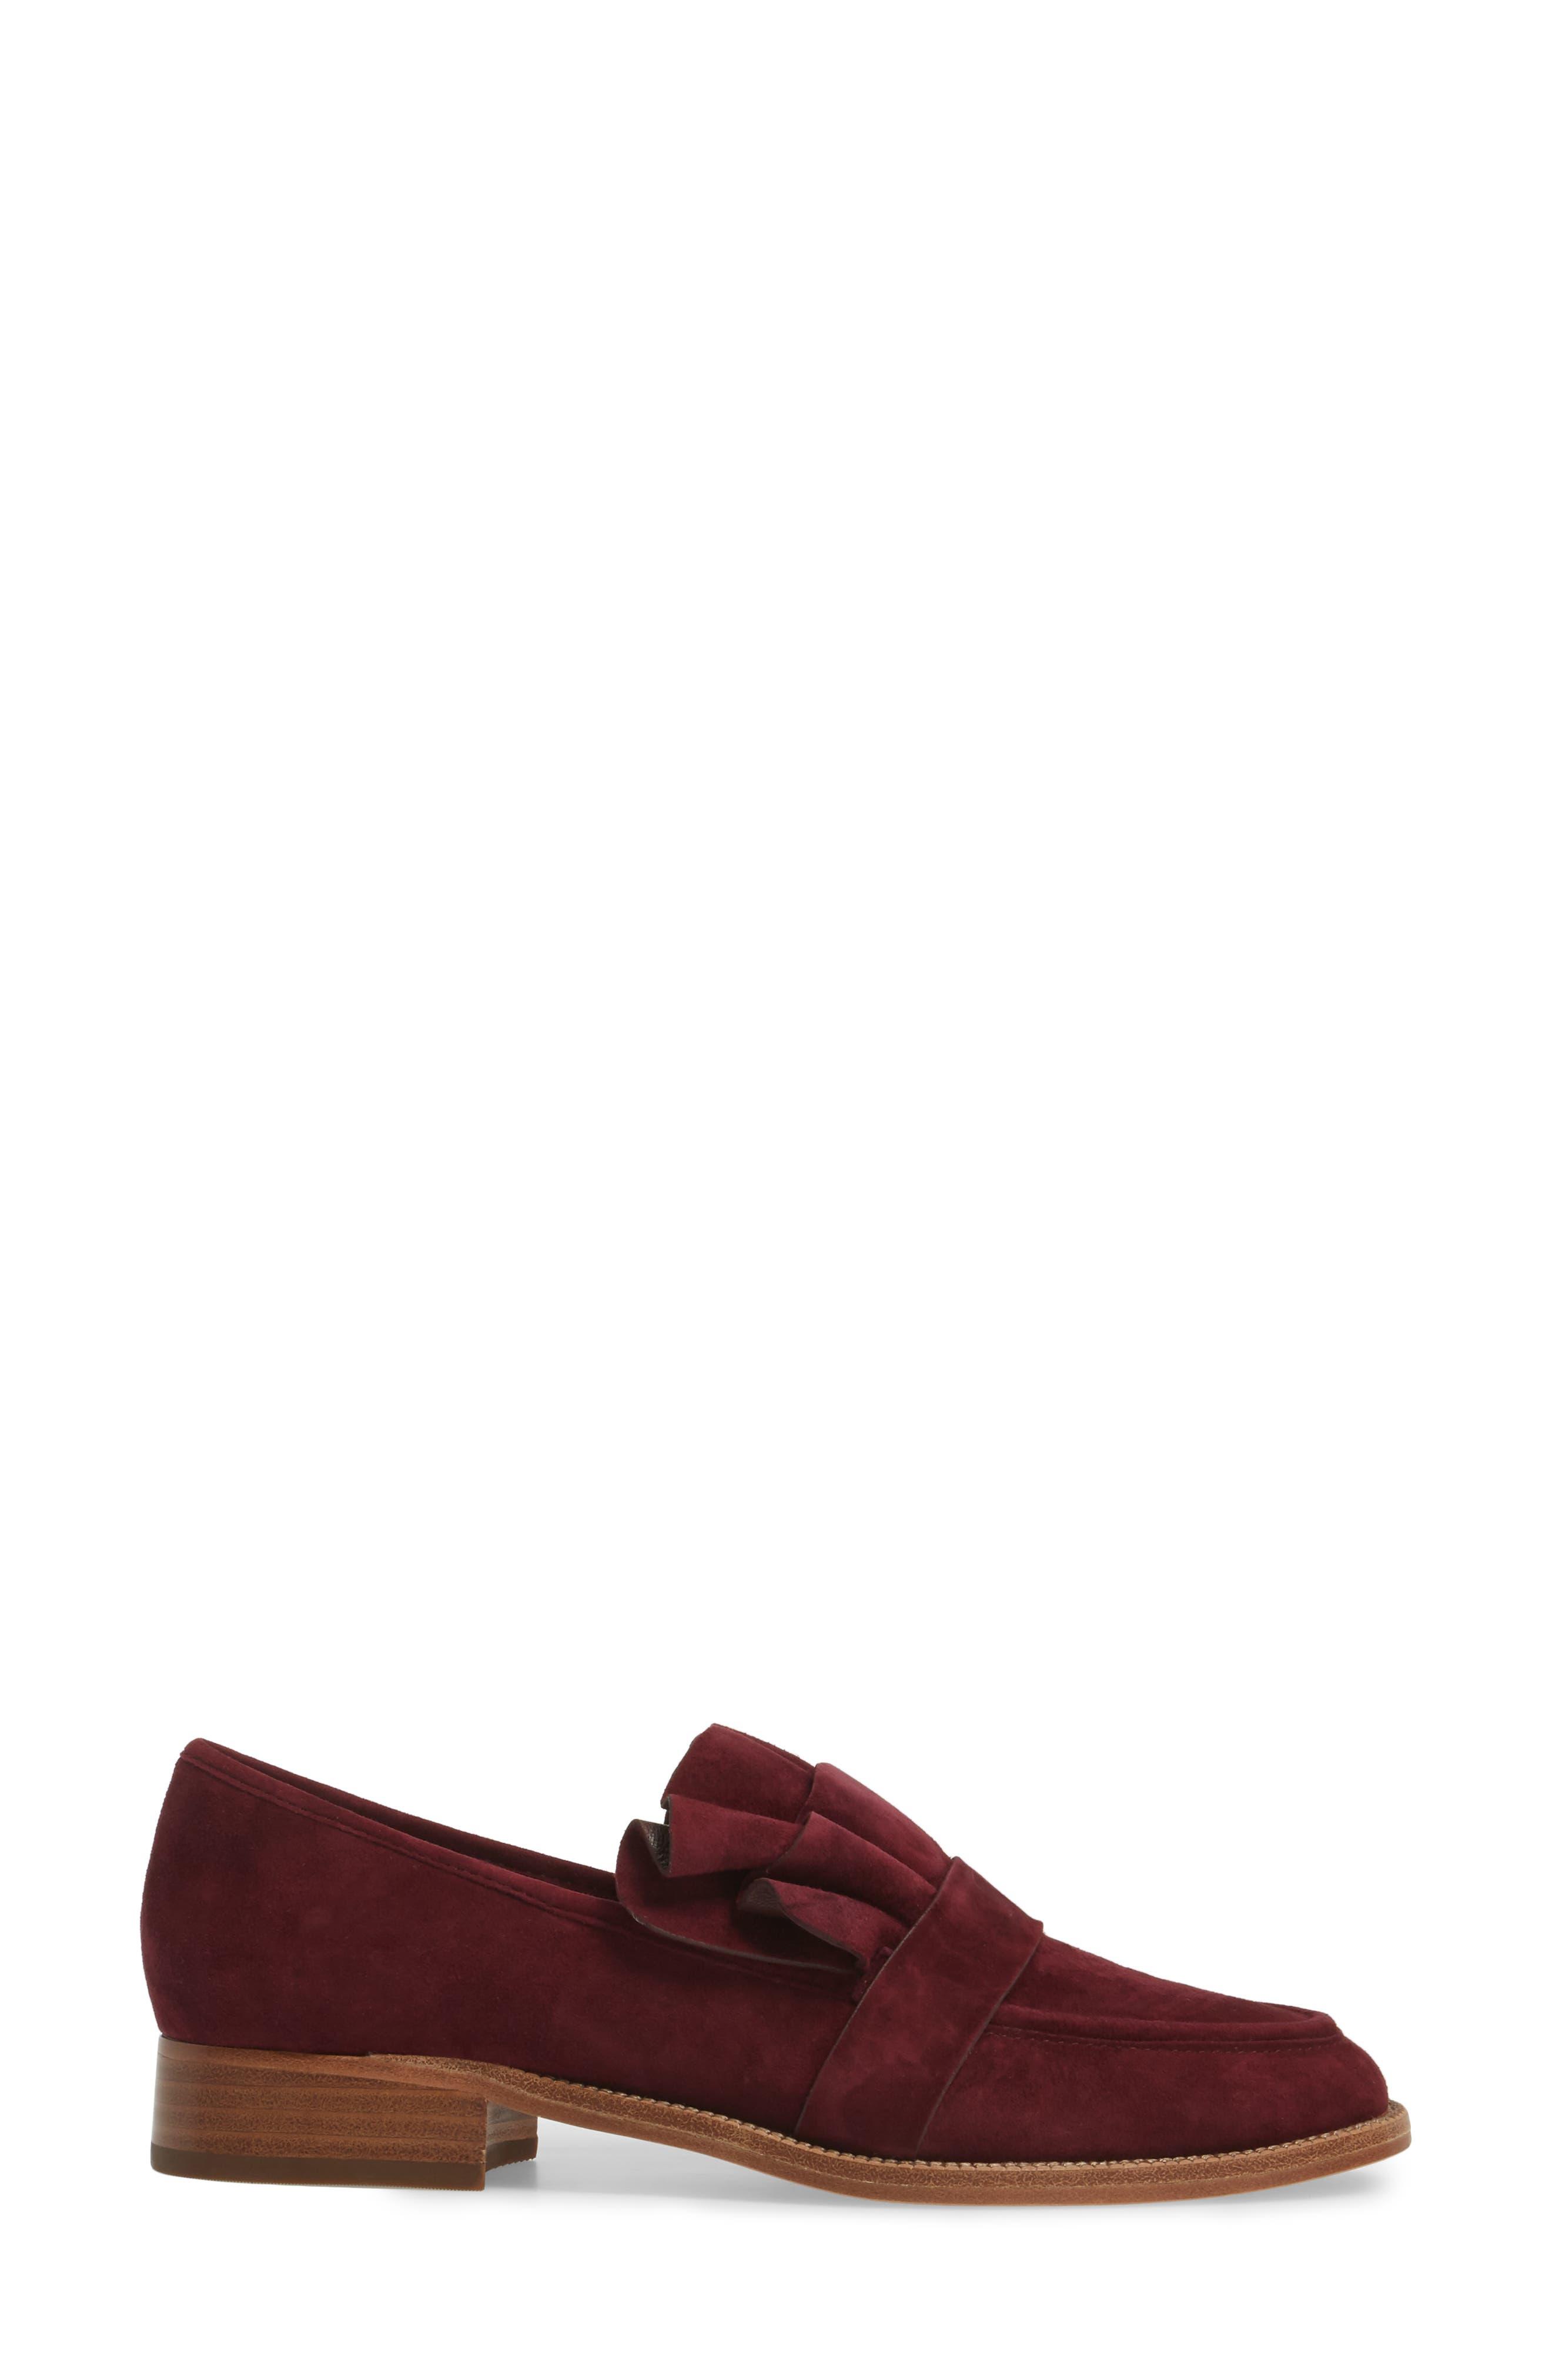 Alternate Image 3  - Pour la Victoire Tenley Ruffled Loafer (Women)